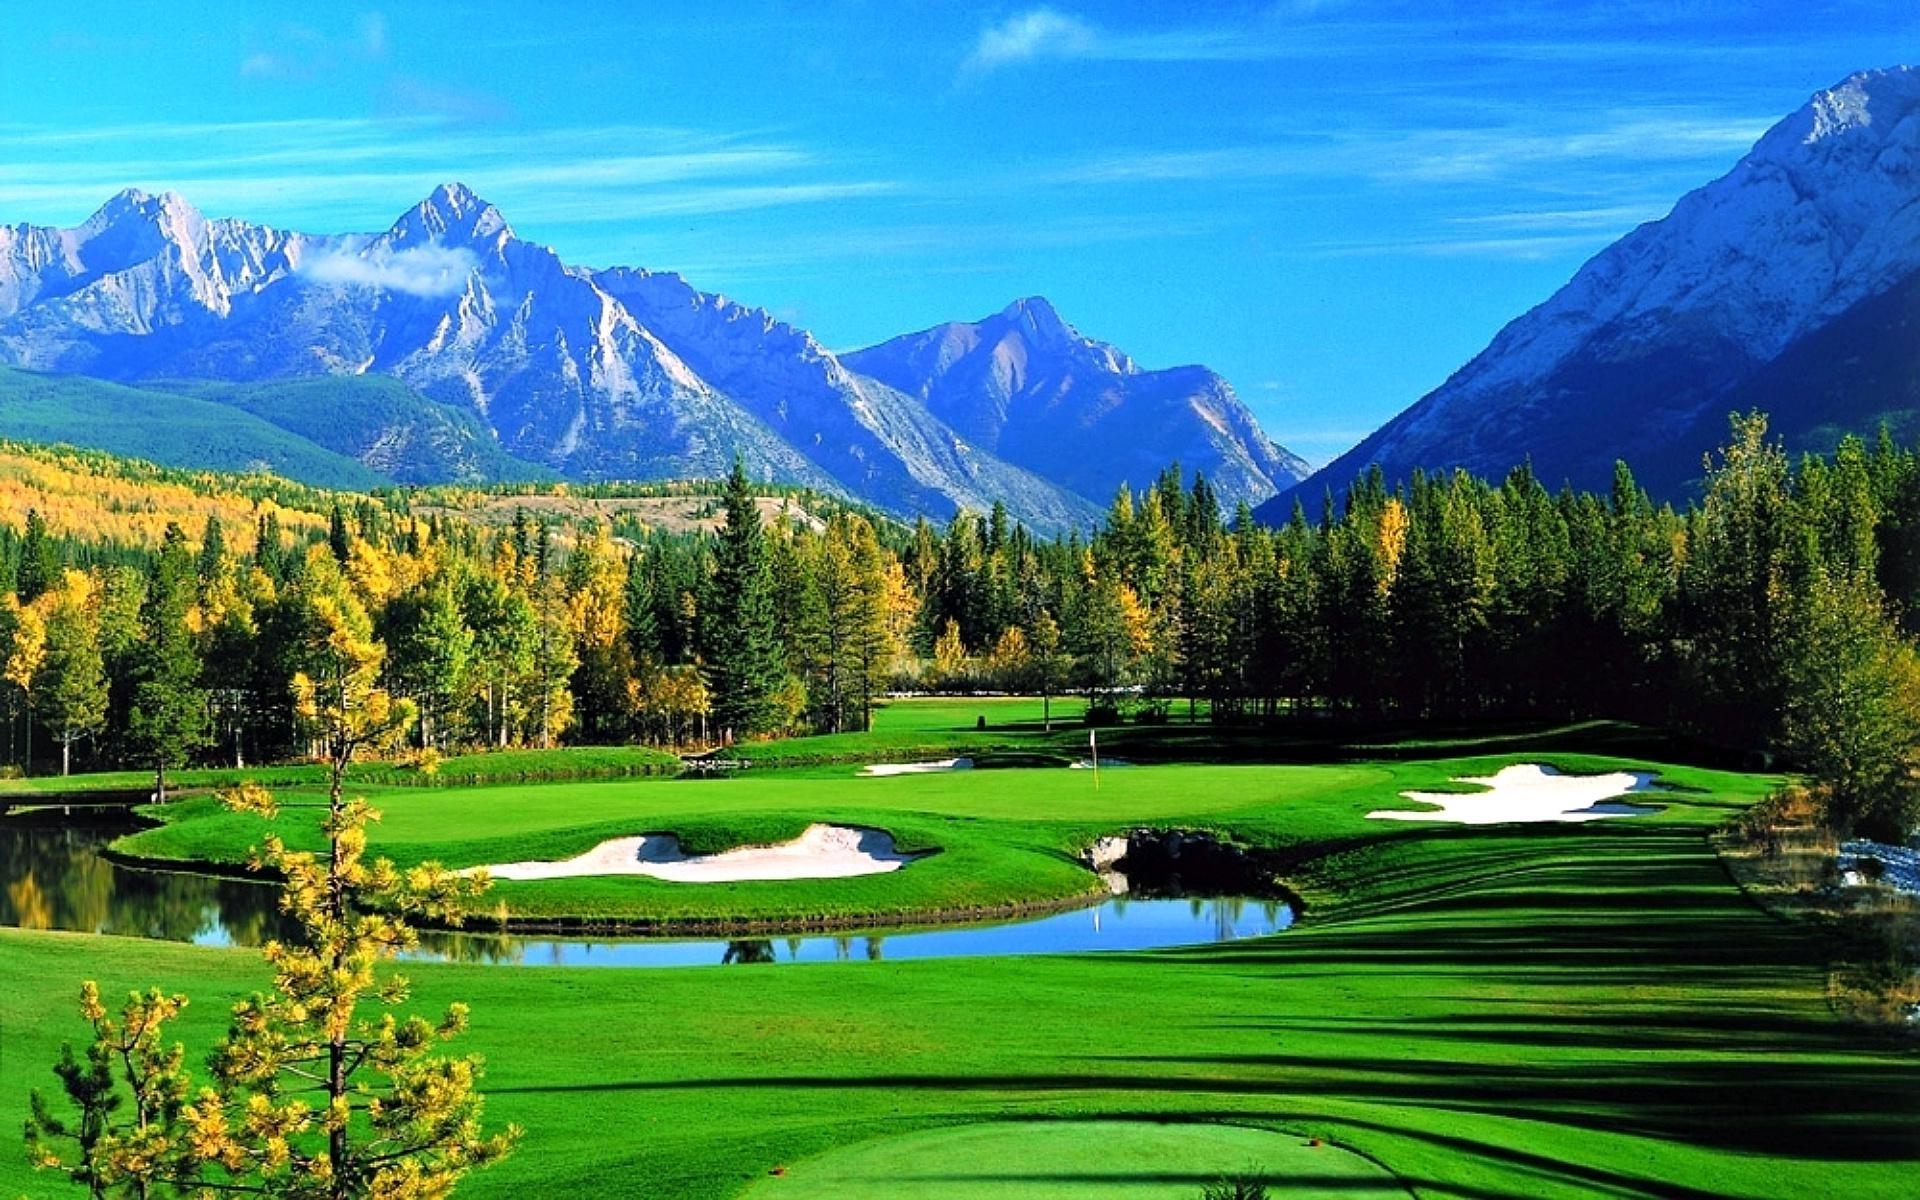 nature & landscape golf course wallpapers (desktop, phone, tablet